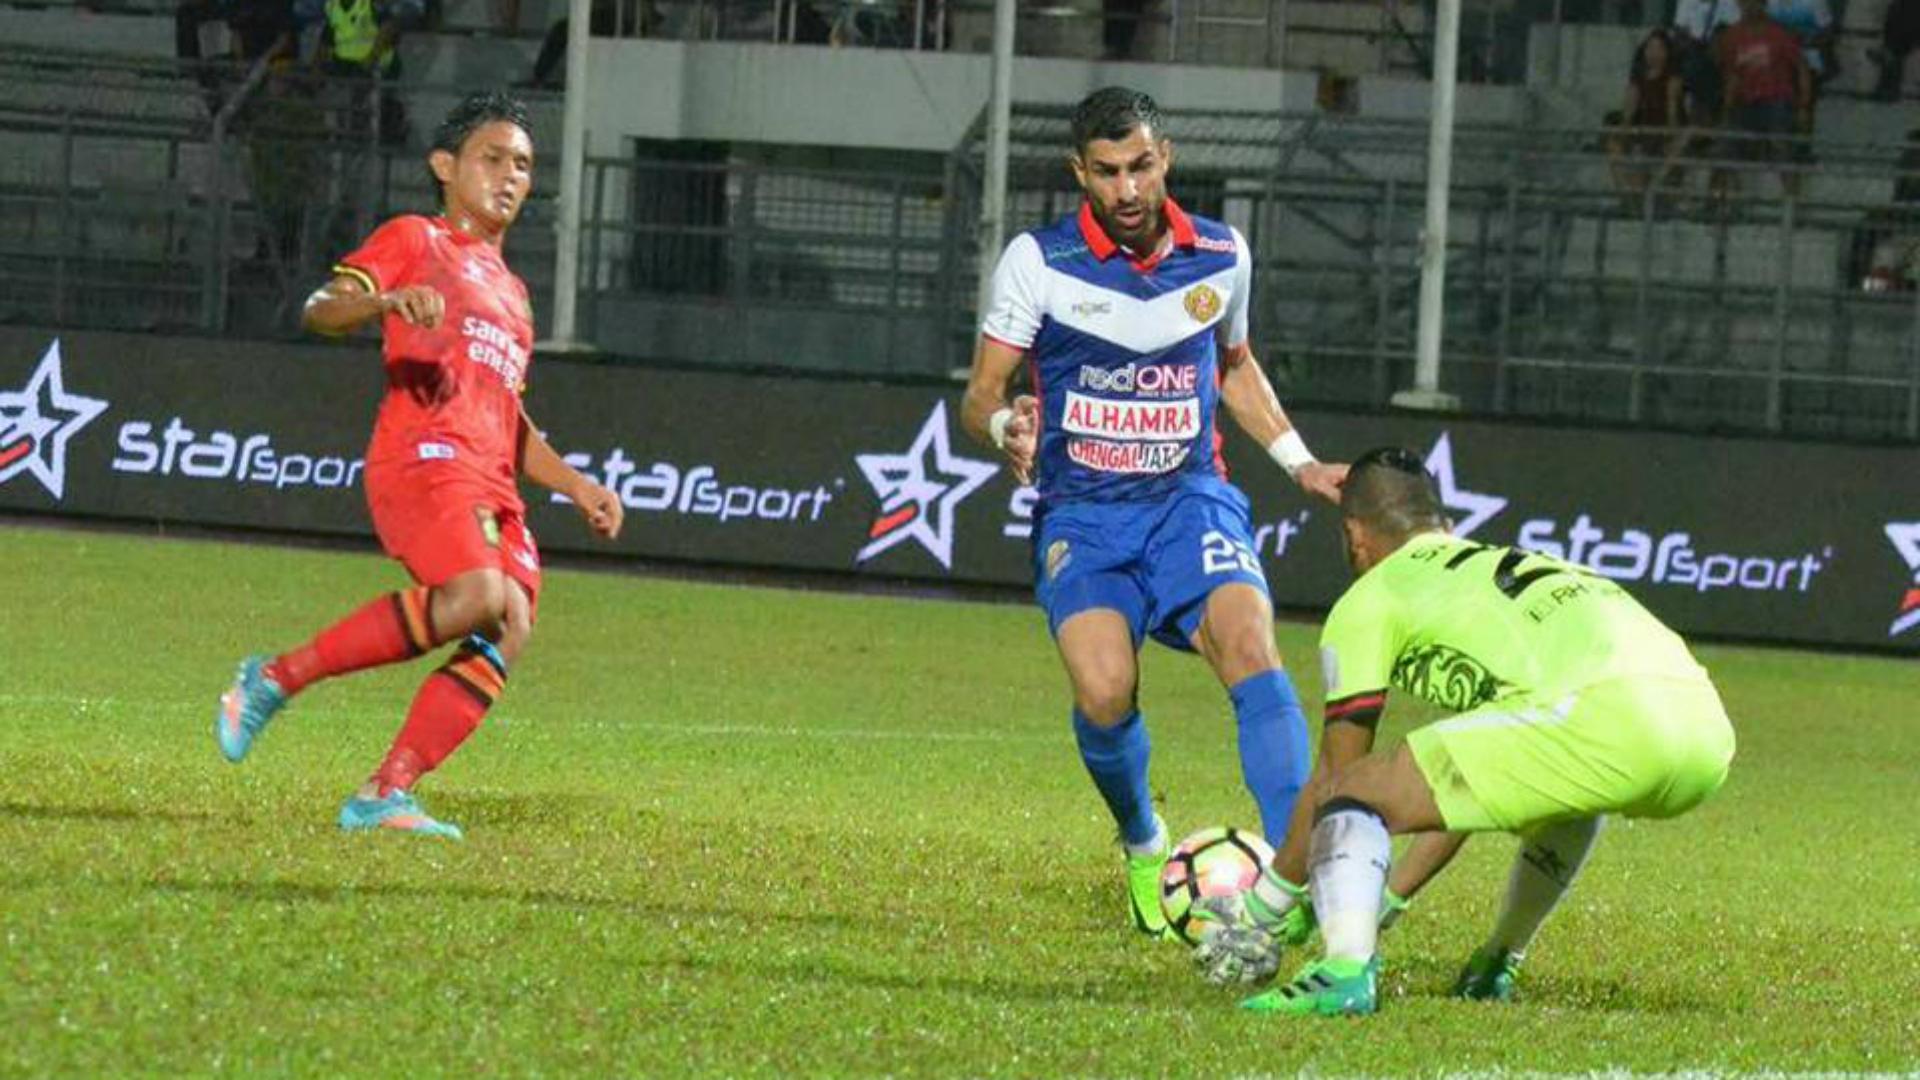 Sarawak, Kelantan, Super League, 26/04/2017